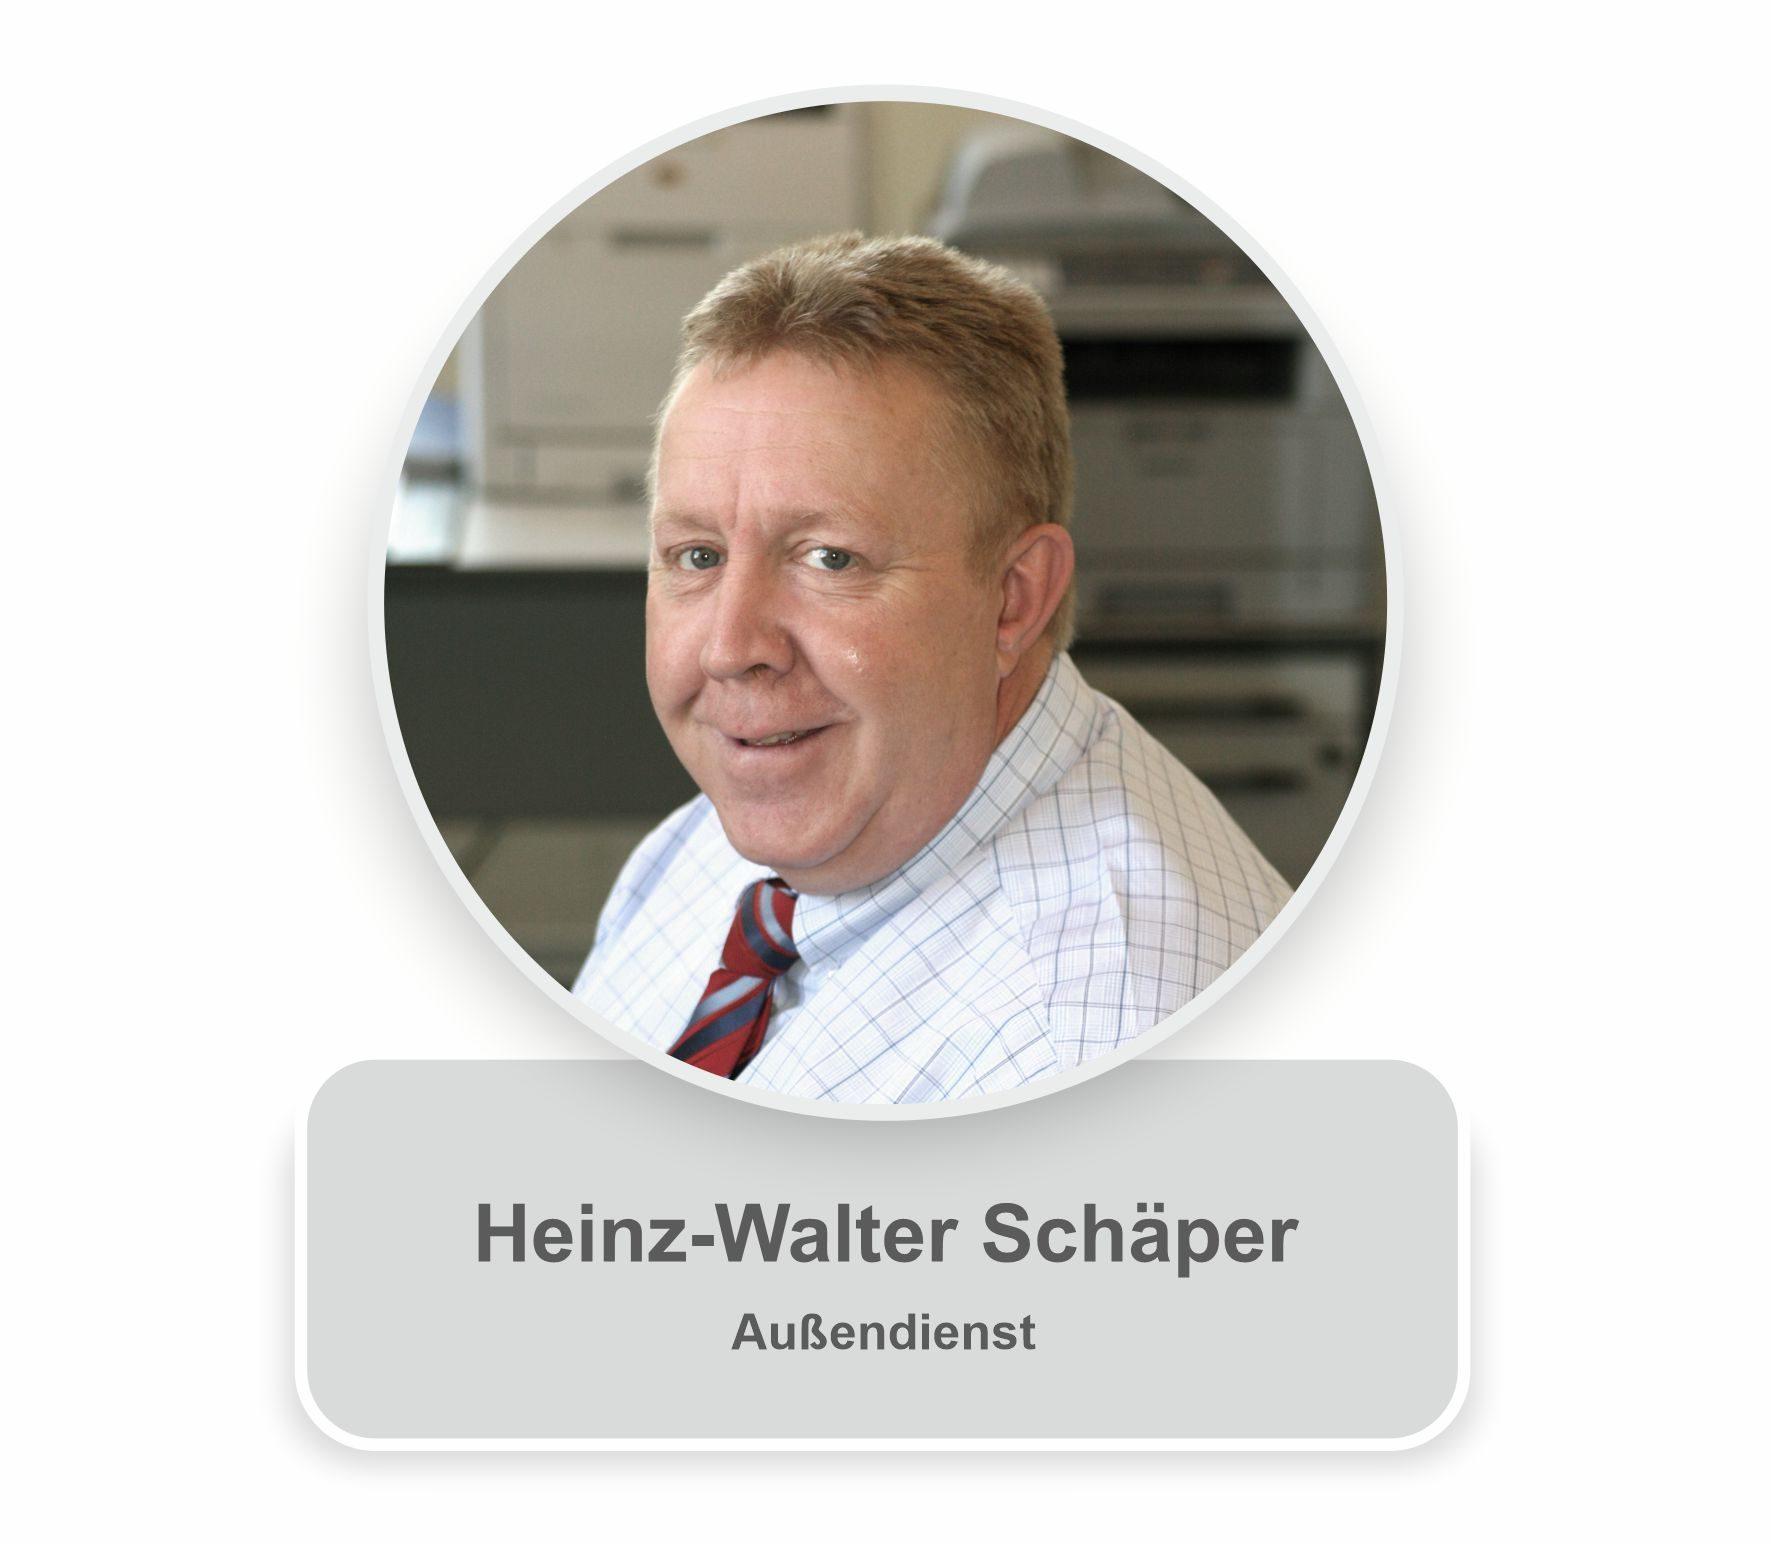 Heinz-Walter Schäper